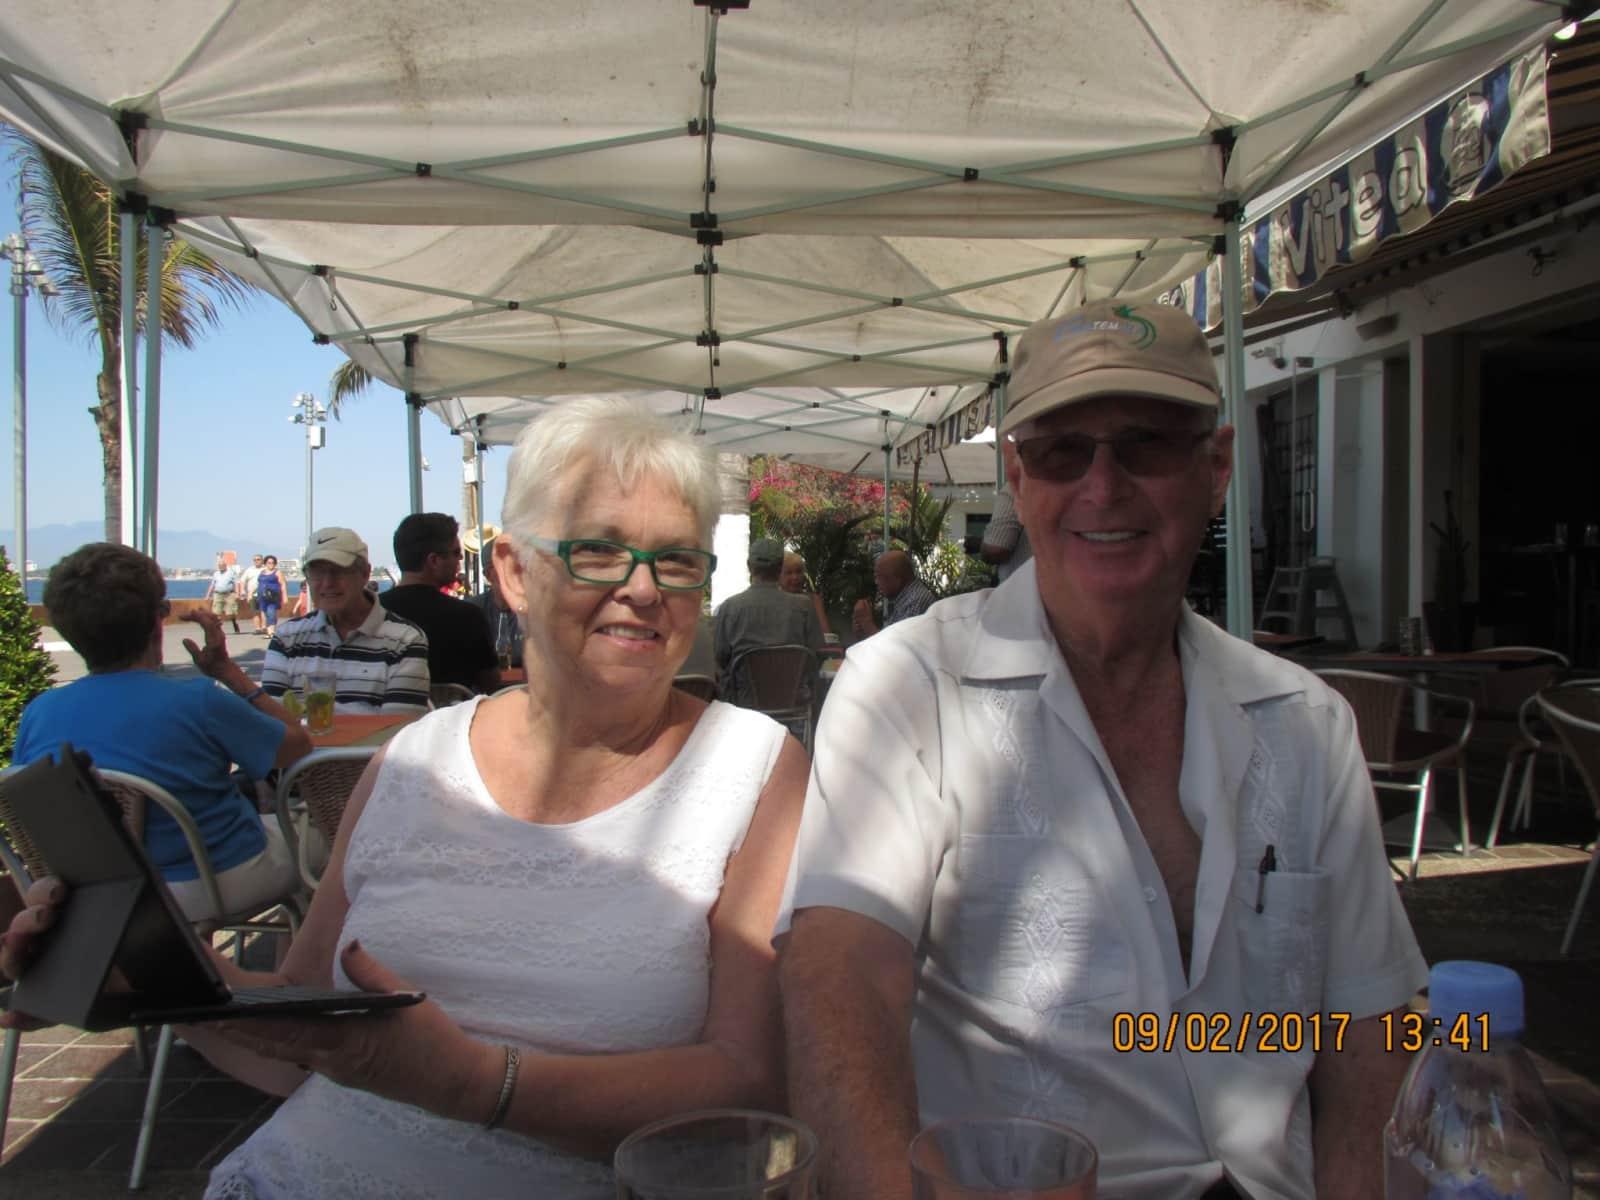 Beverley & Terry from Calgary, Alberta, Canada